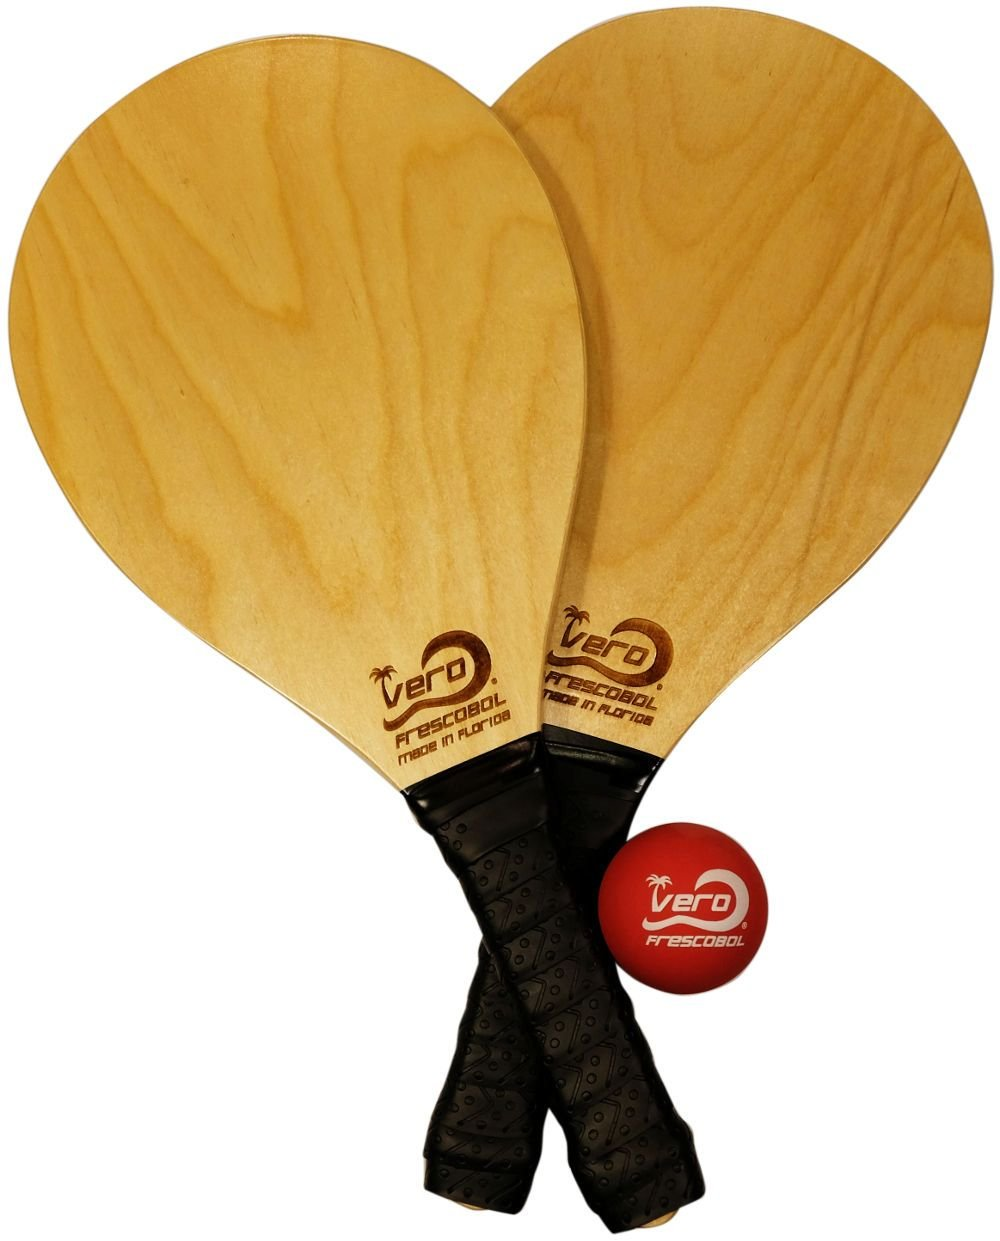 Vero Frescobol American Birch Wood Beach Frescobol Paddle Set Official Ball Tote bag USA